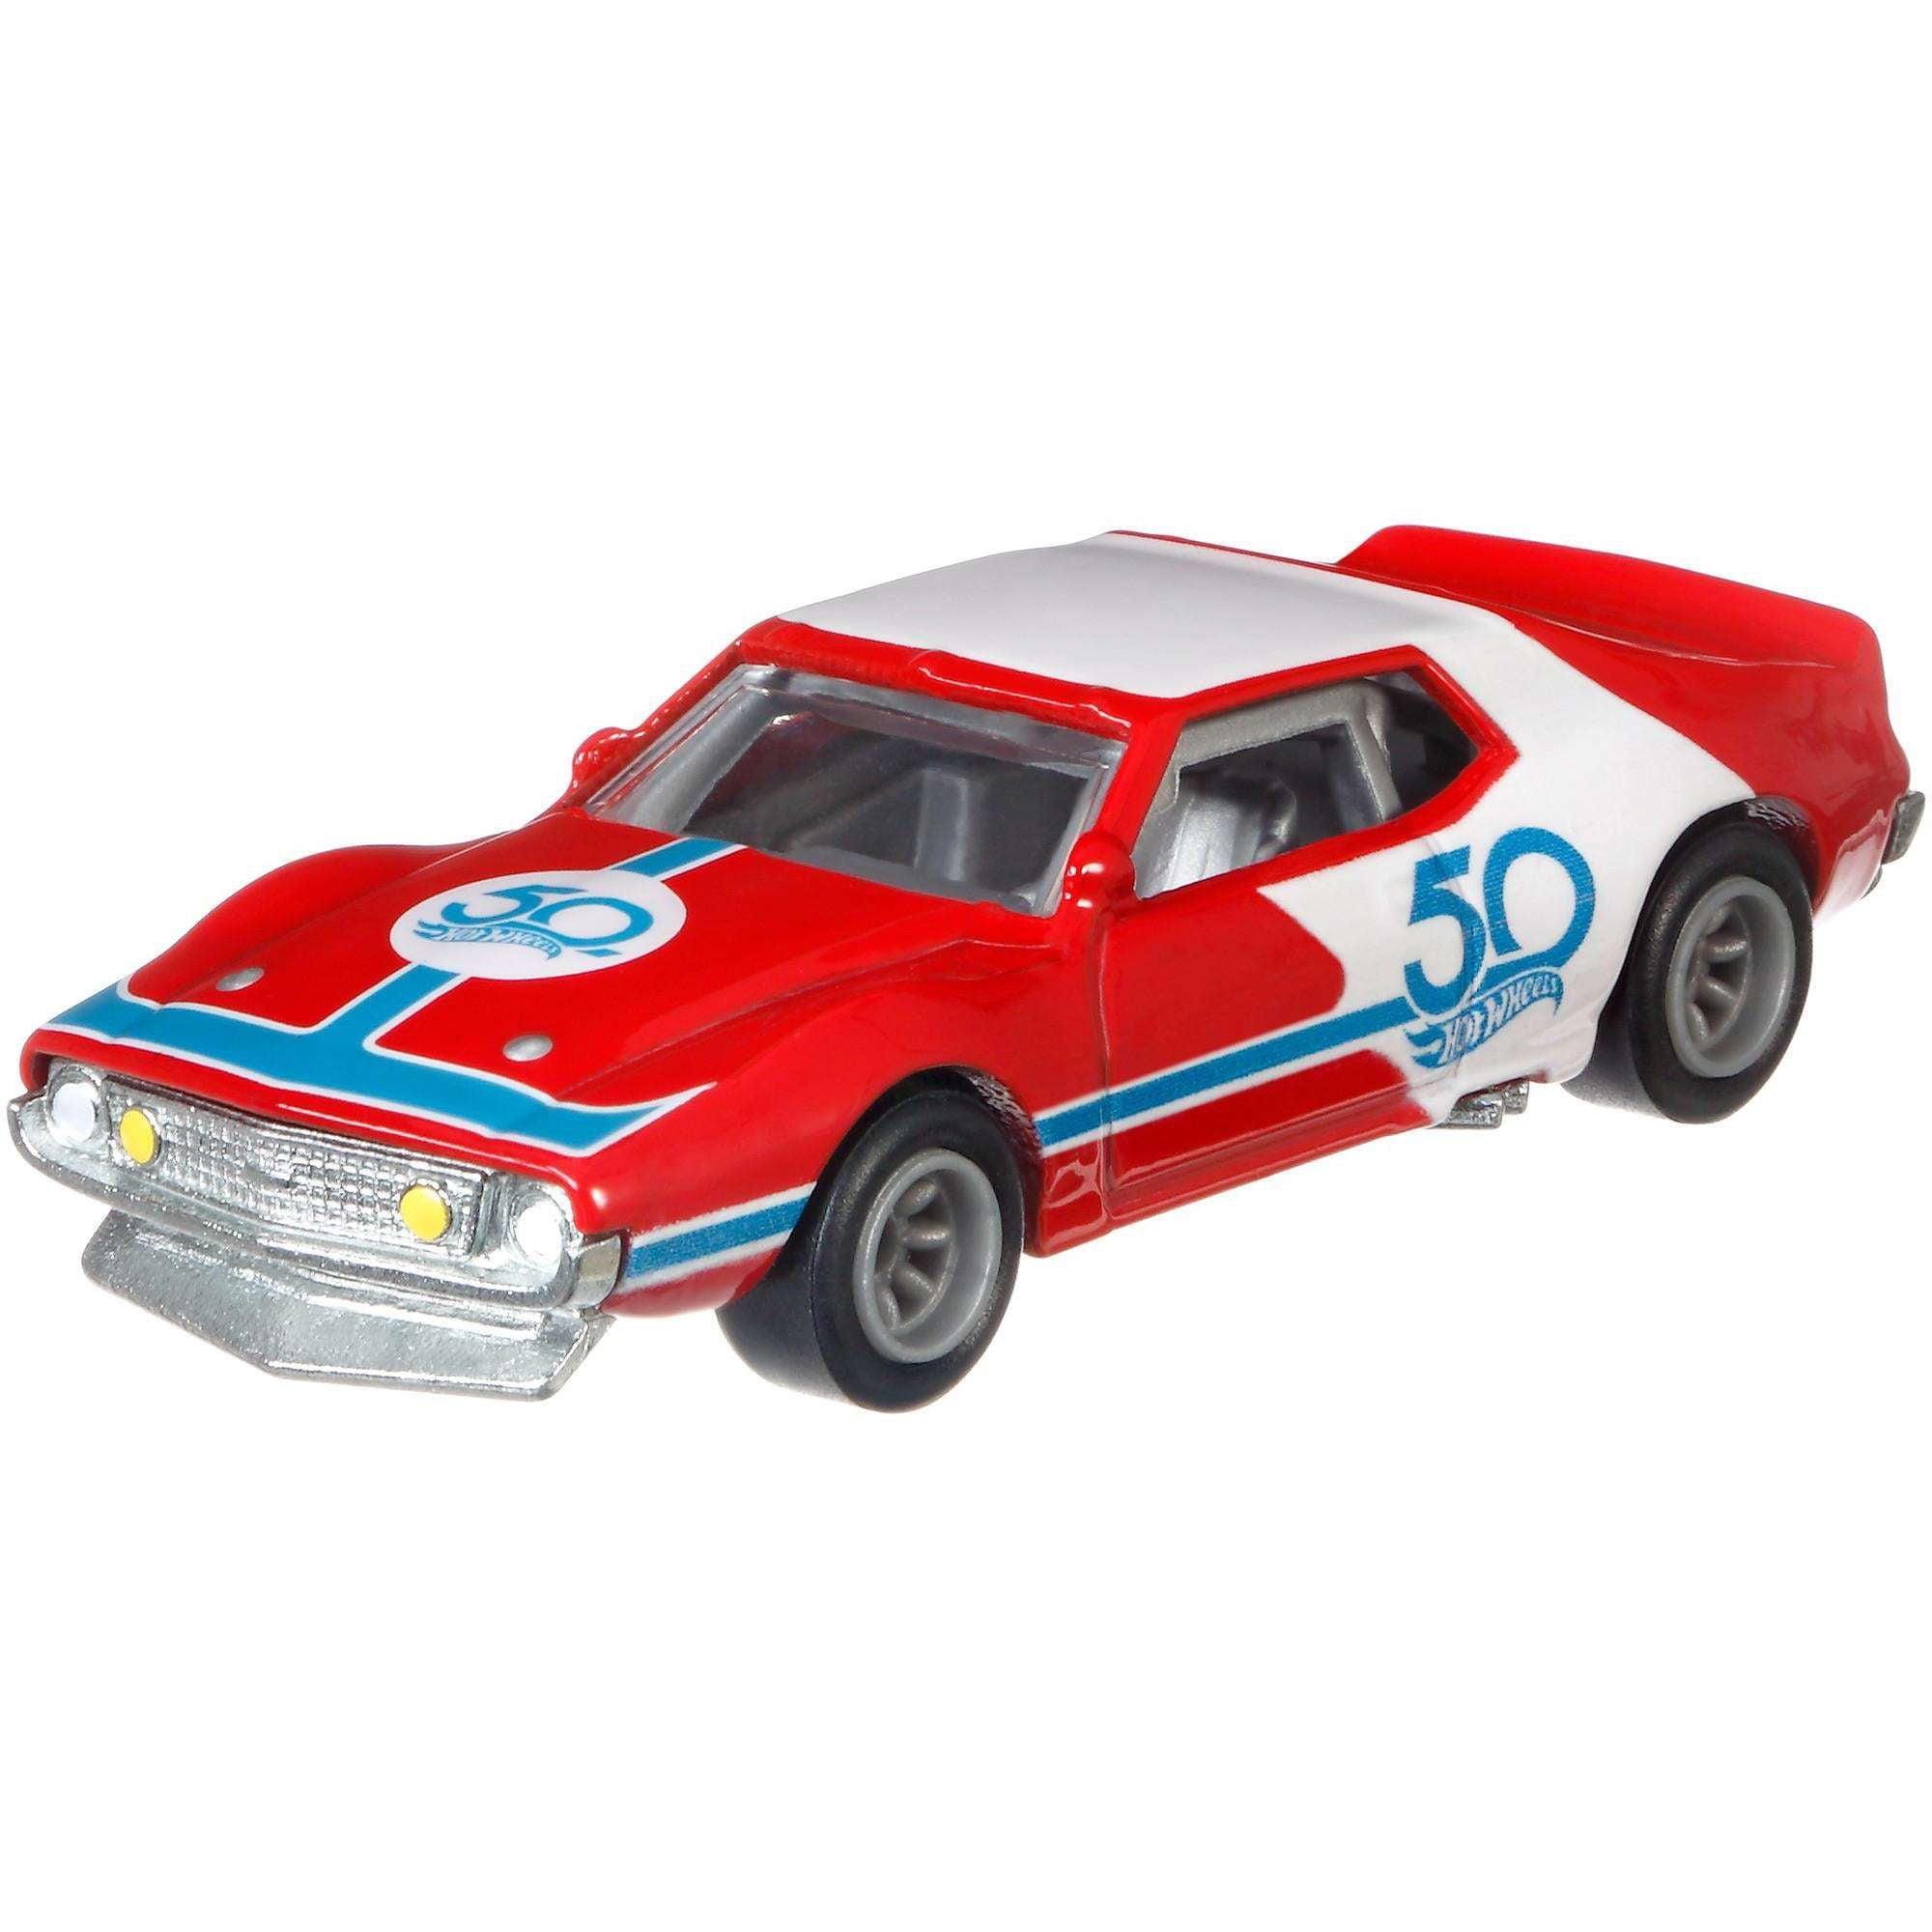 2018 Hot Wheels Real Riders 50th Anniversary   U CHOOSE   ships//Box//bubble wrap